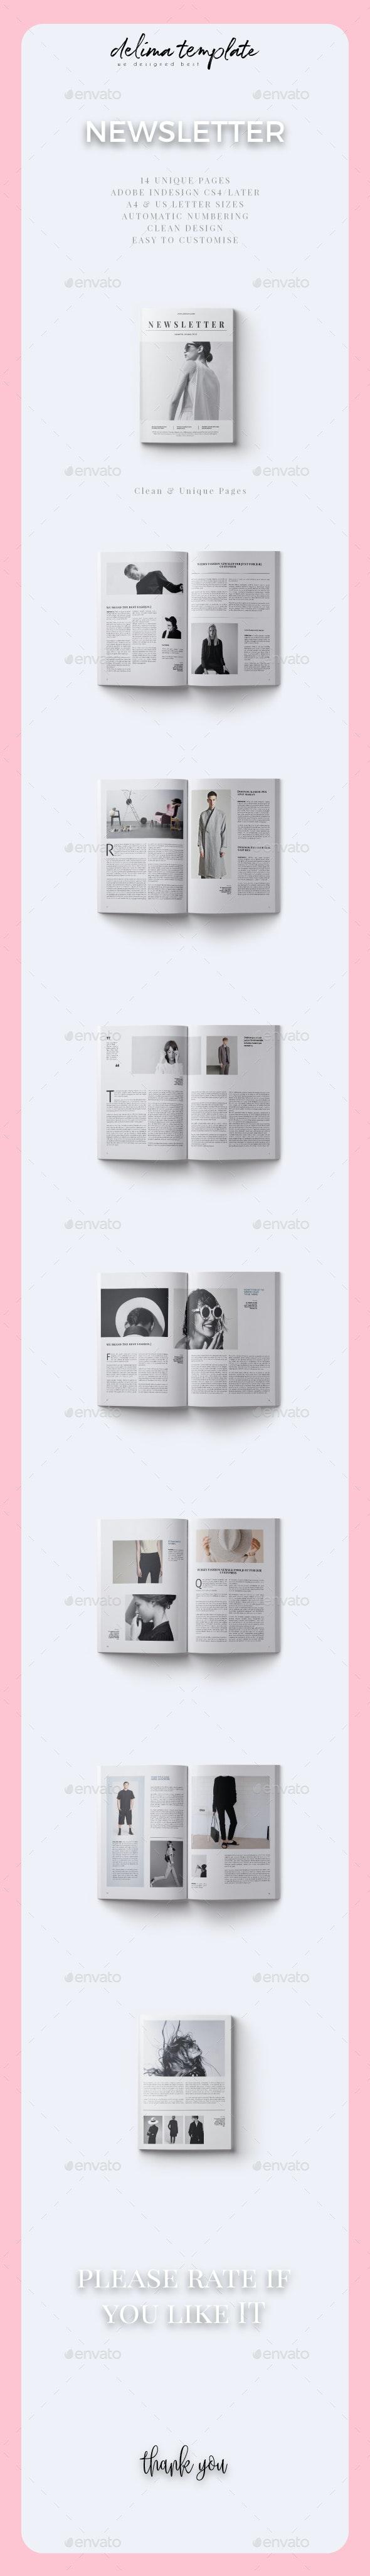 Newsletter Vo. 01 - Newsletters Print Templates